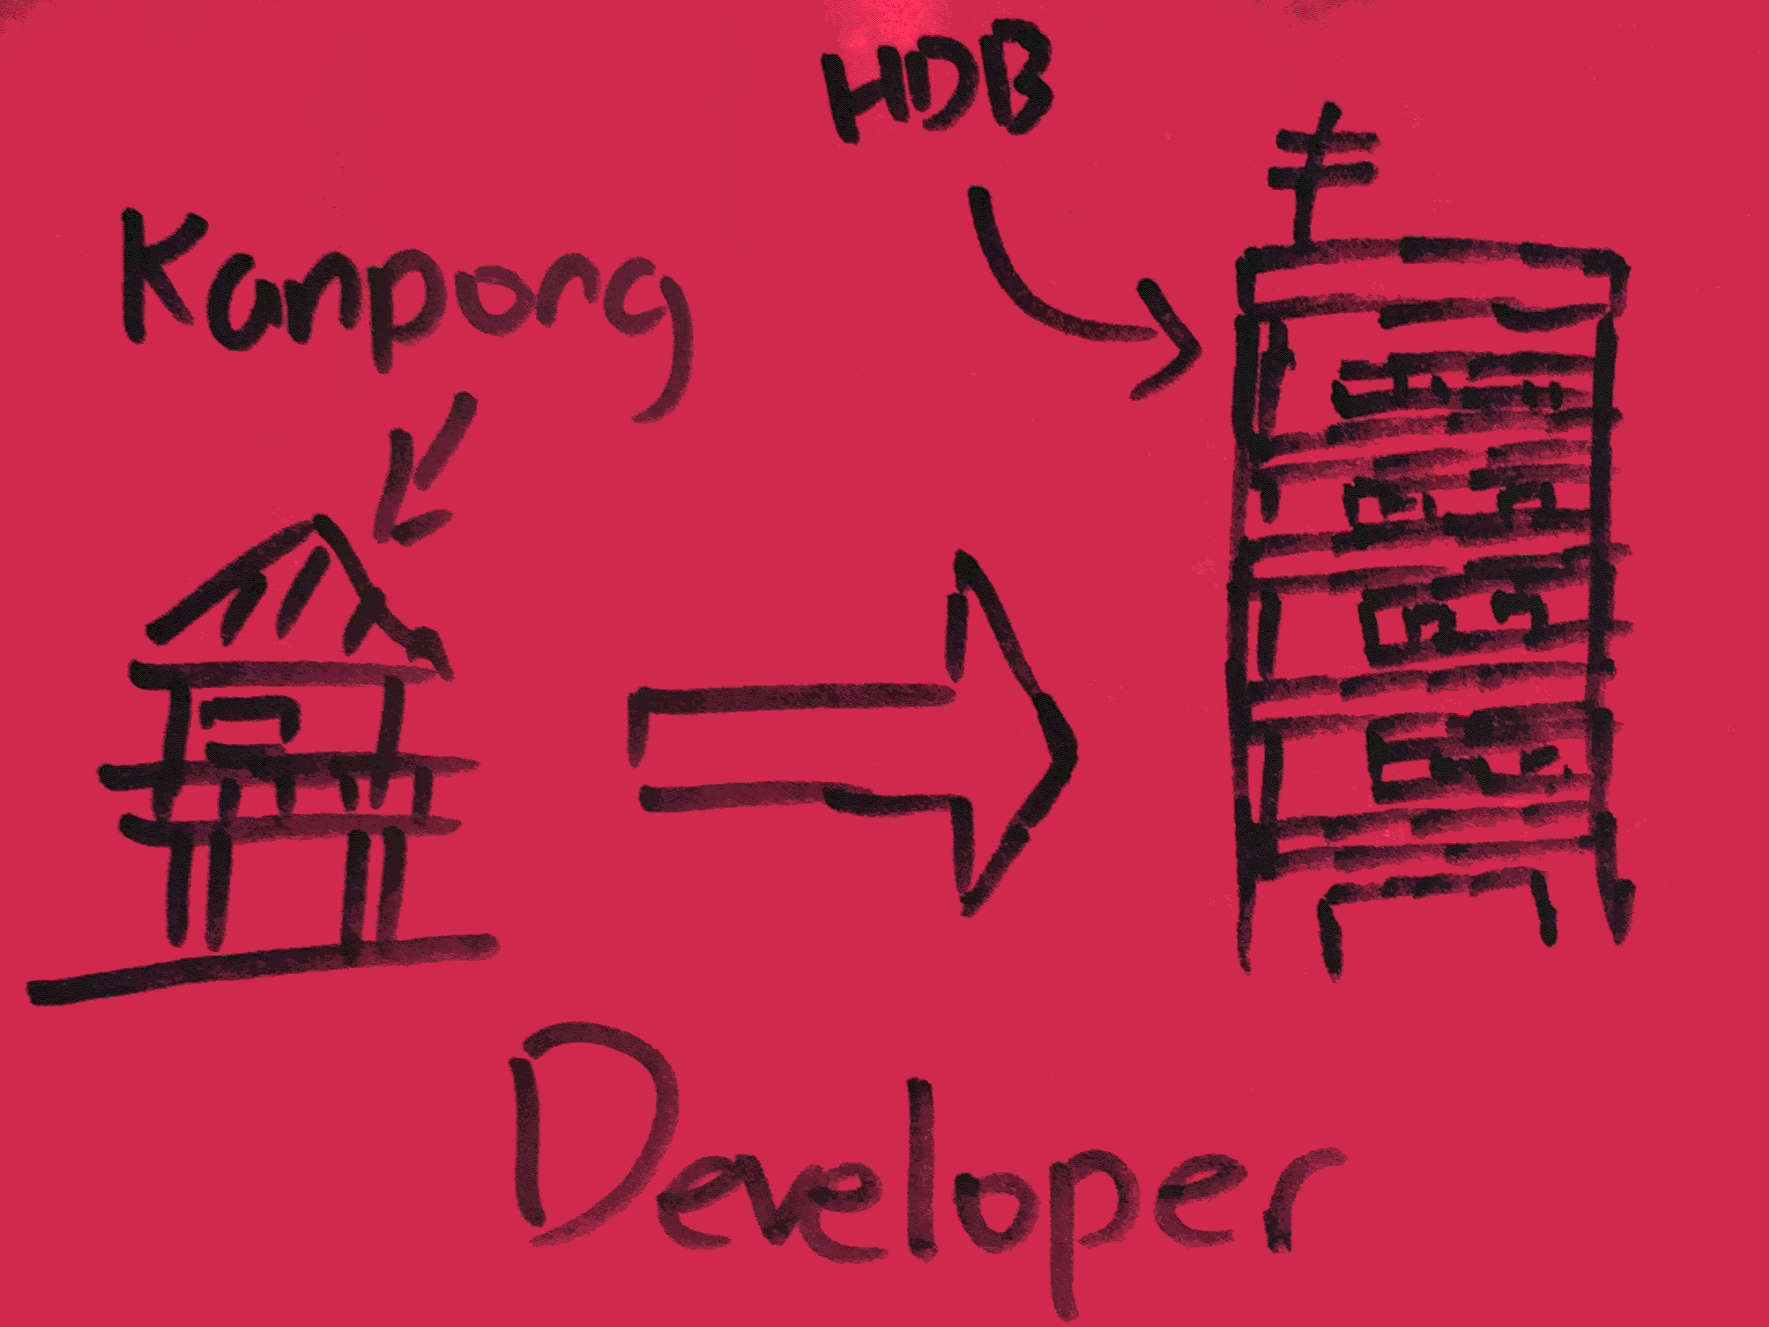 Developer Strengthsfinder Upgraded Kampong to HDB